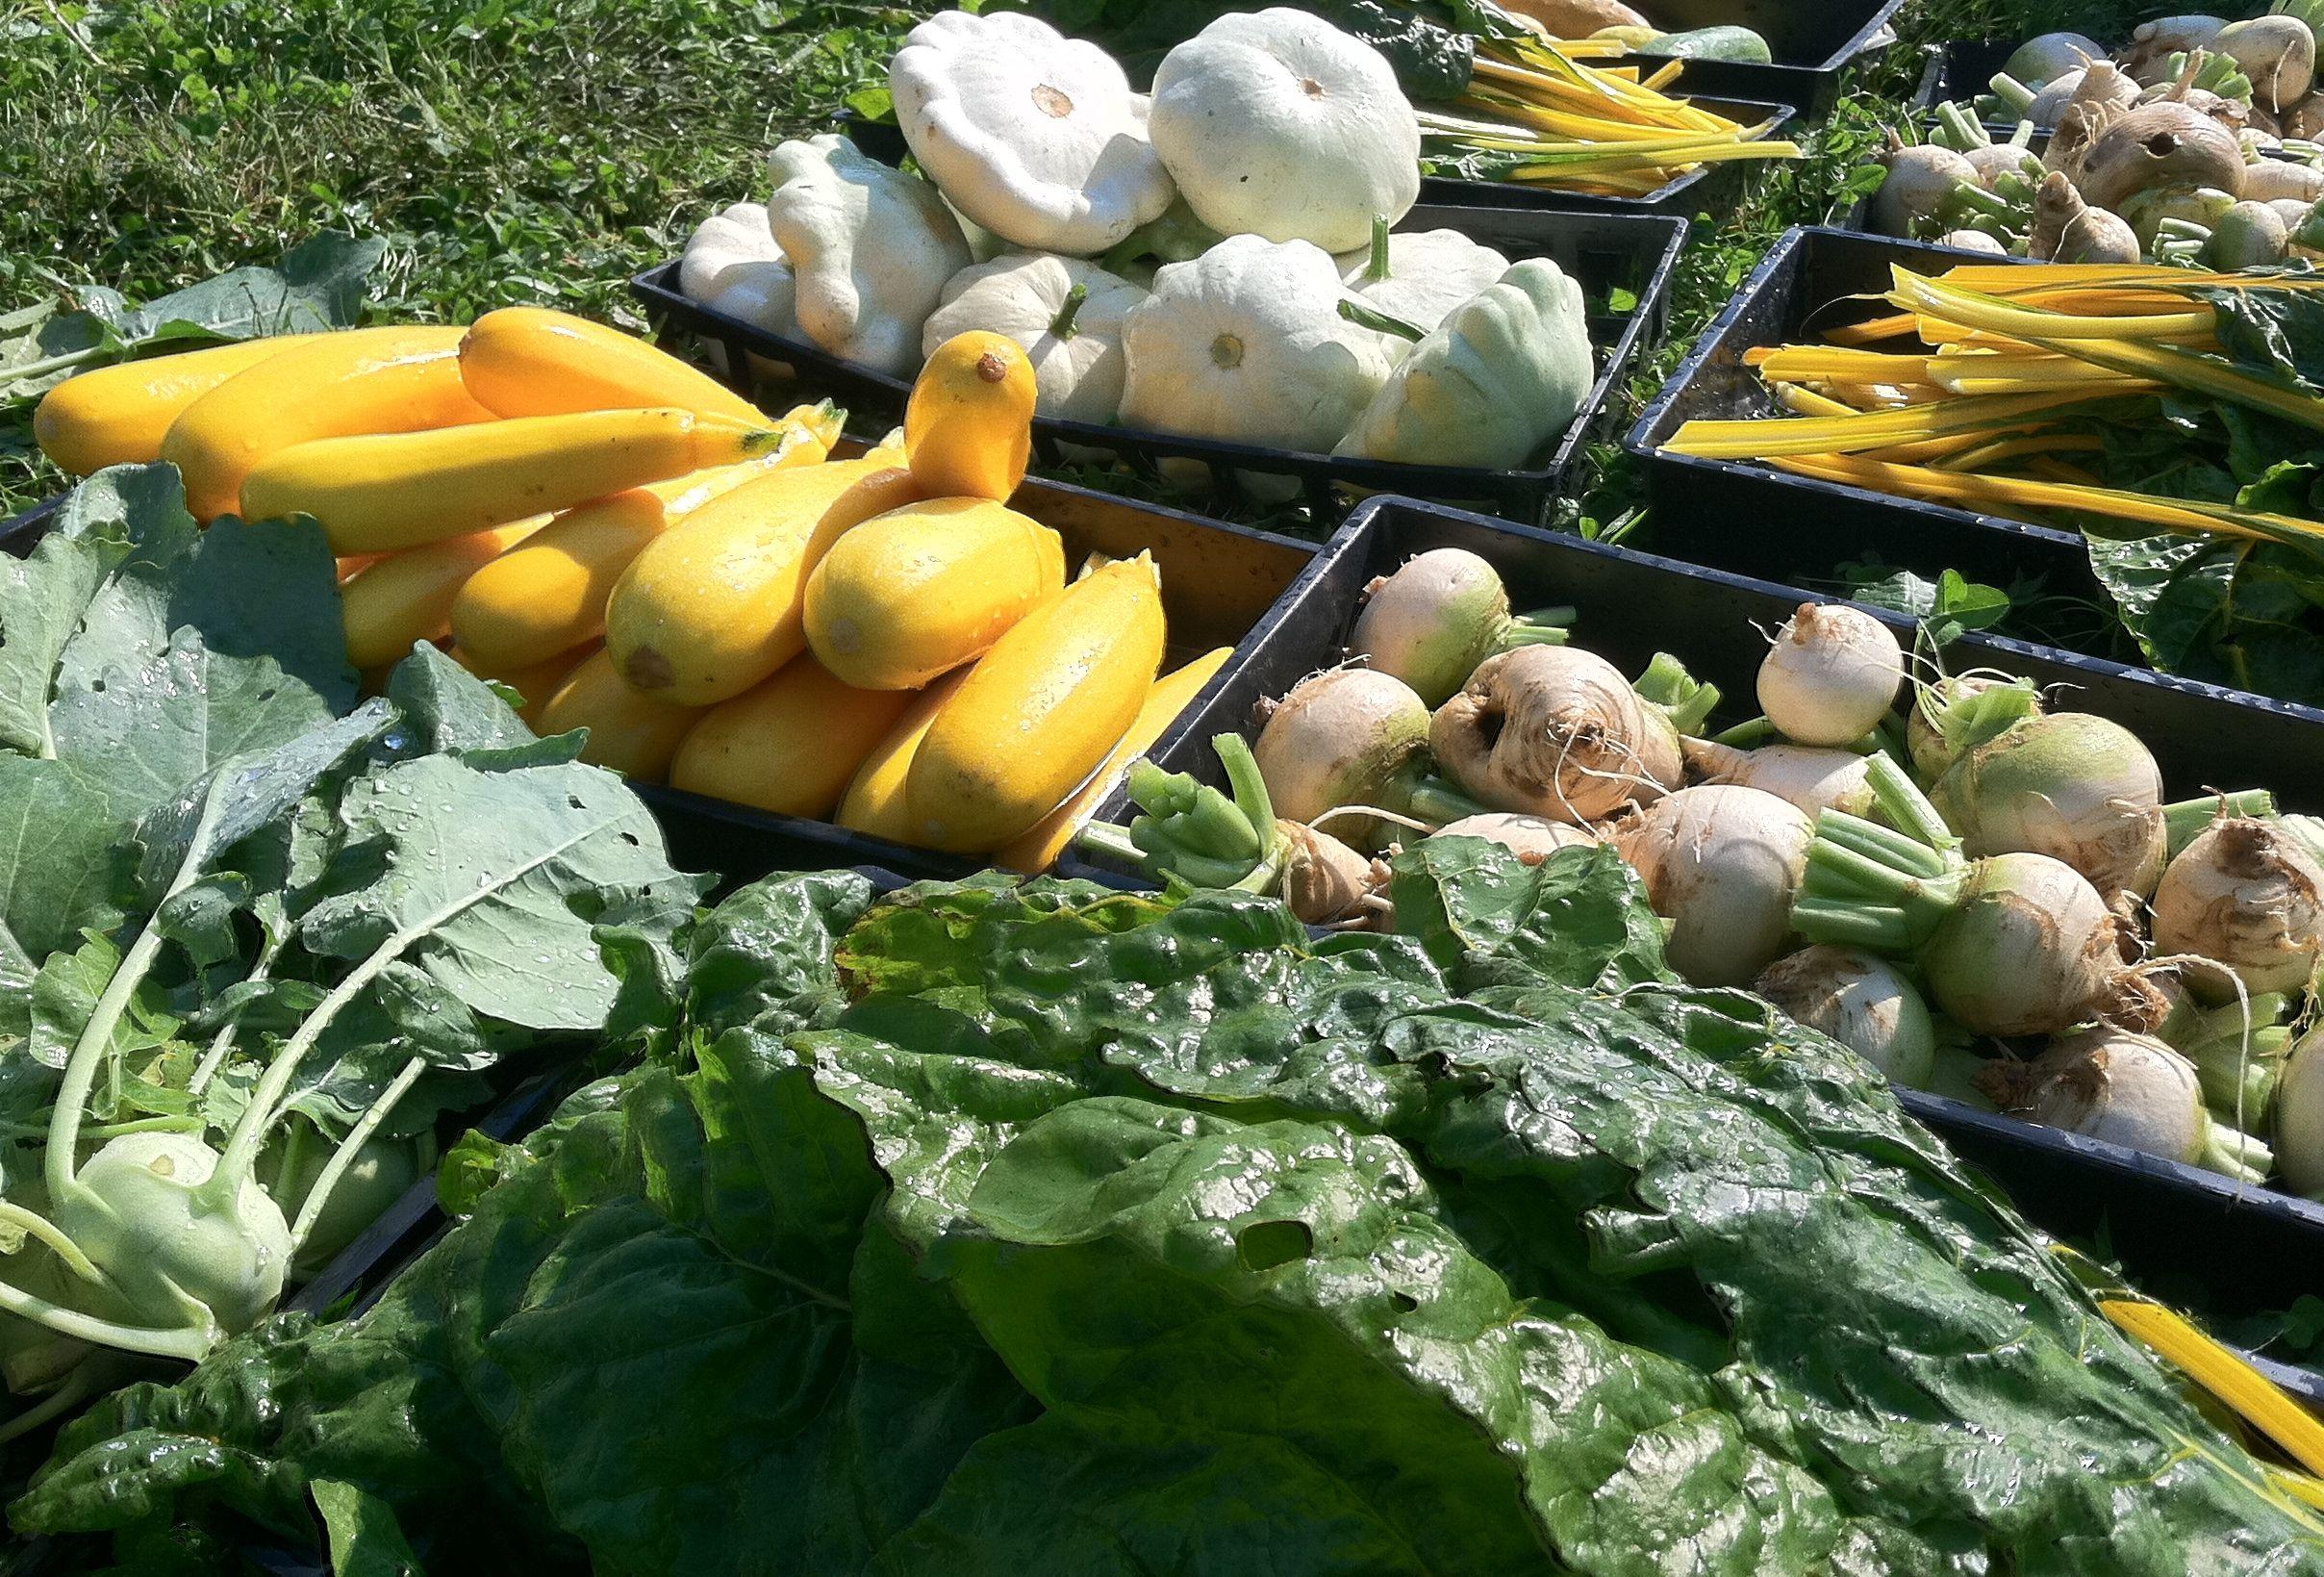 squash turnip